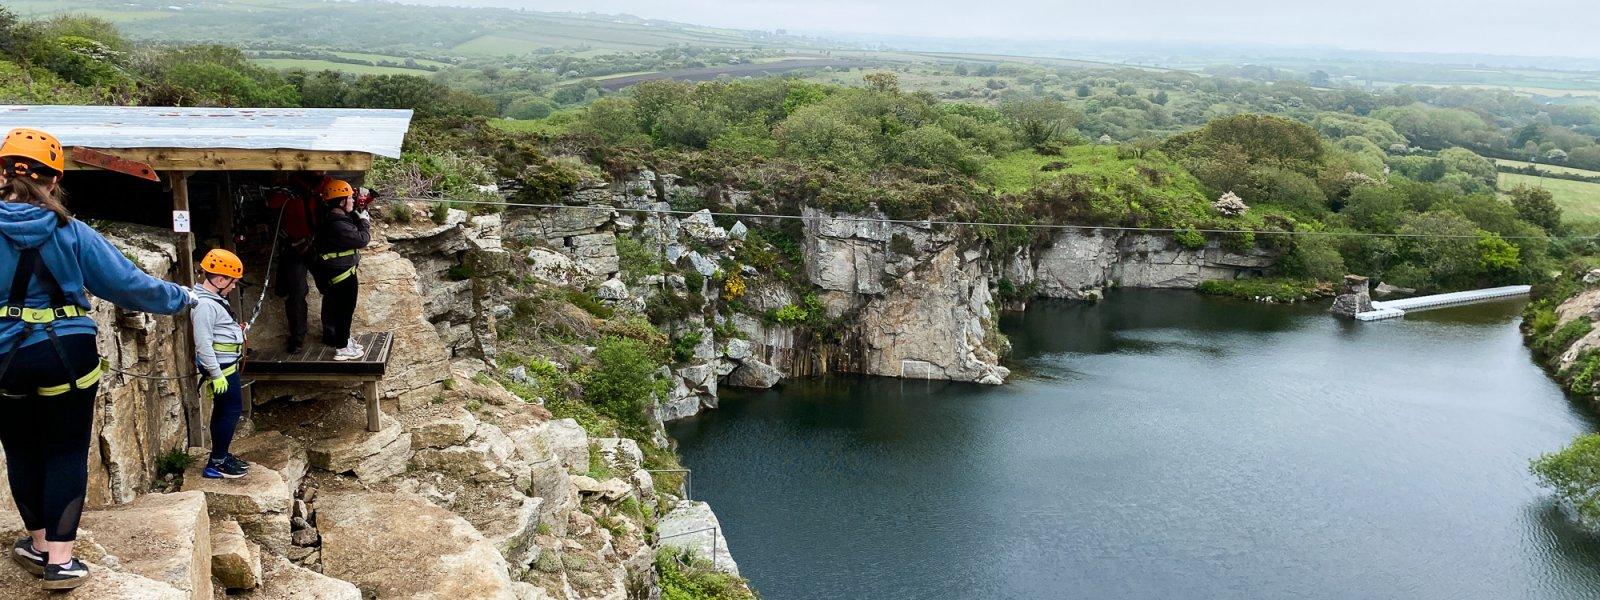 Climbing & Zip-lining in Cornwall with Via Ferrata